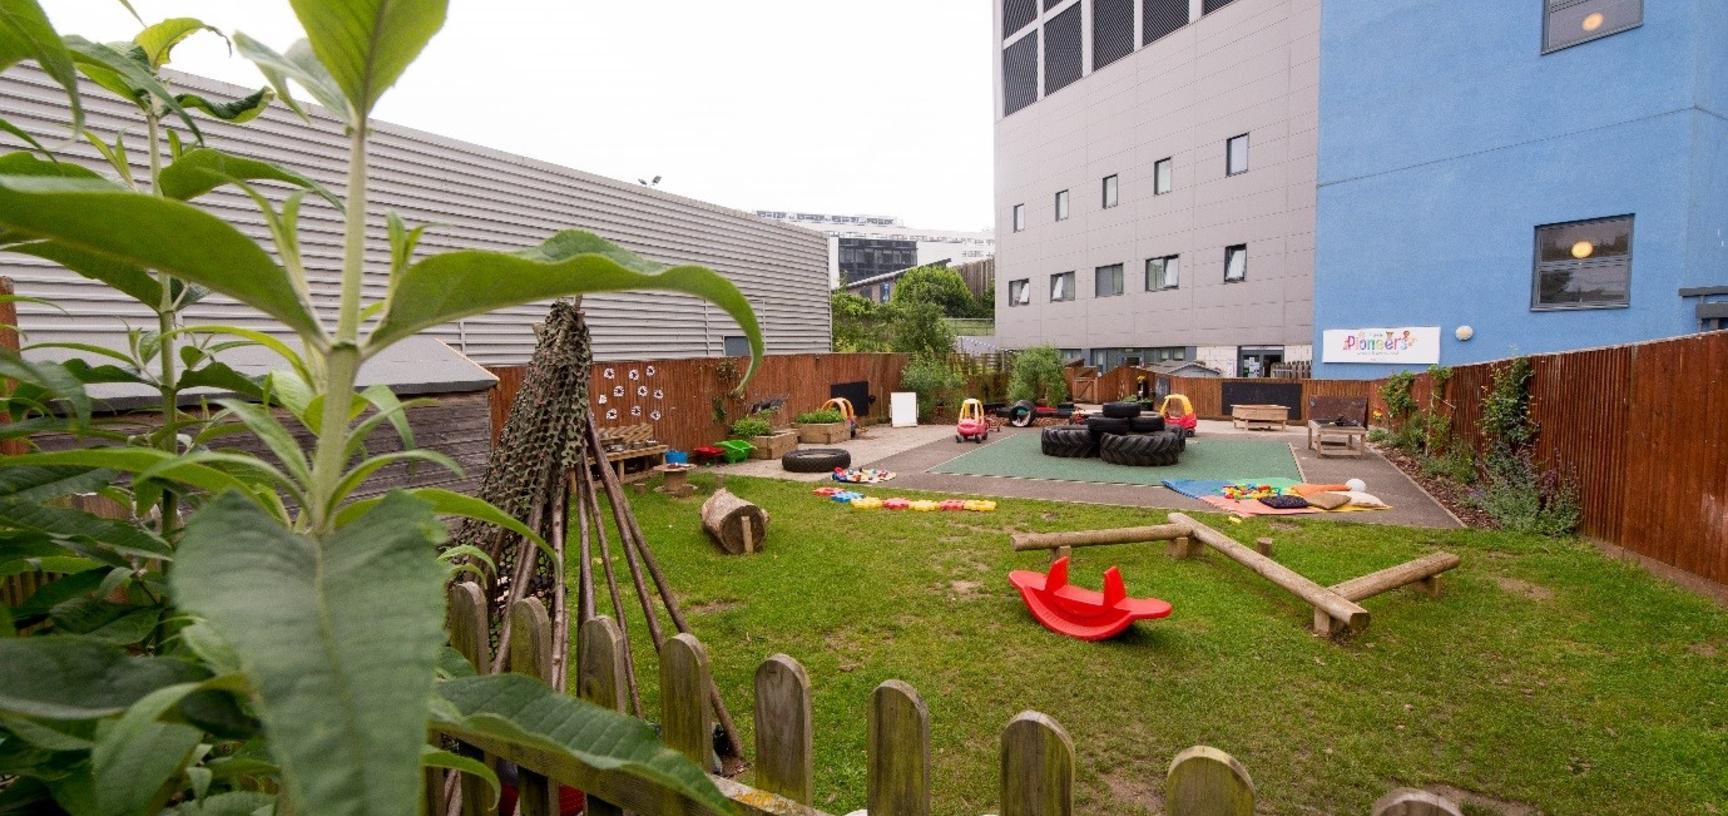 John Radcliffe nursery garden